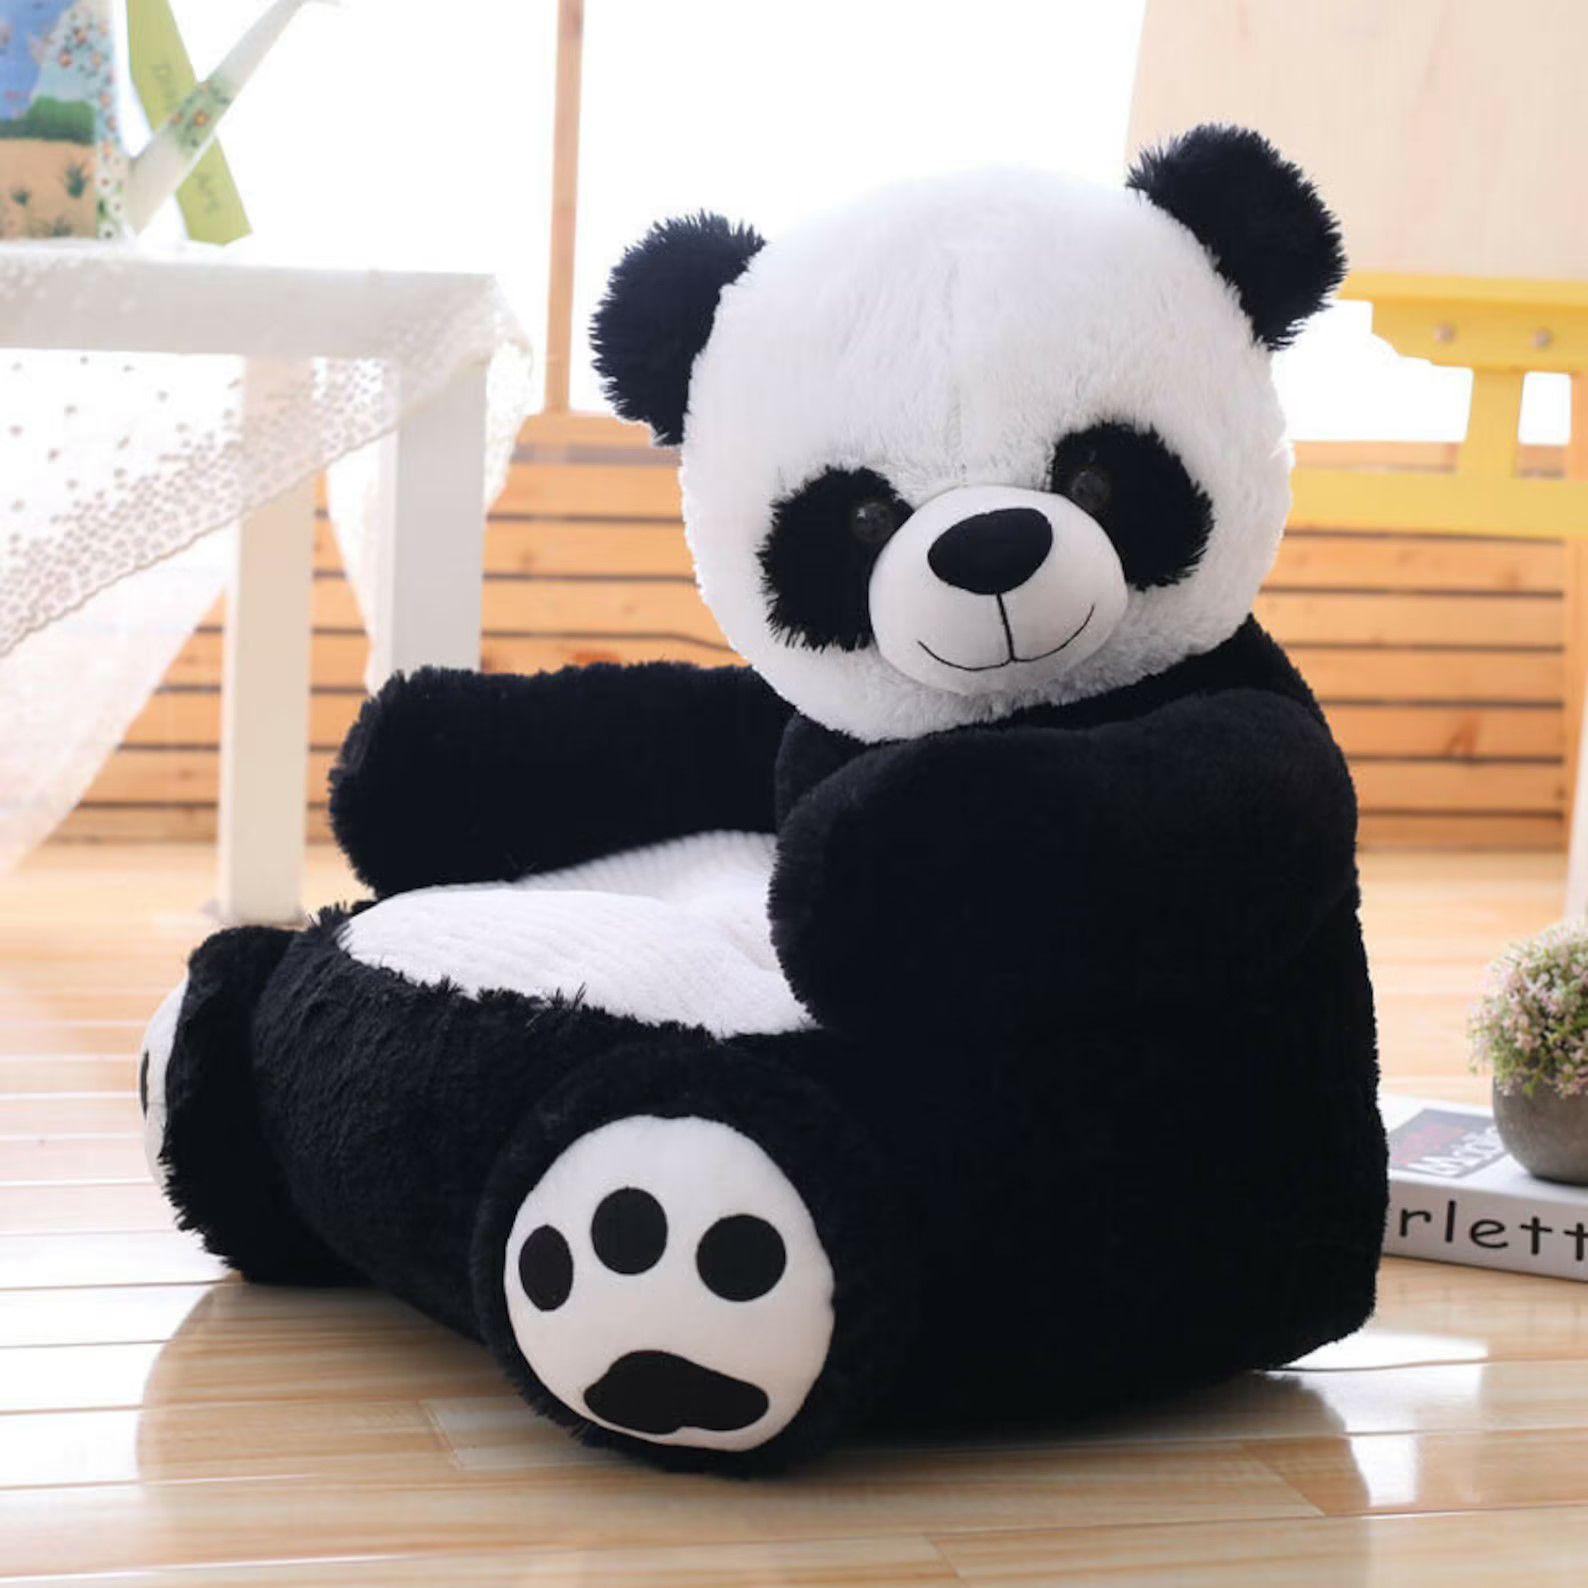 kids chair shaped like a stuffed panda